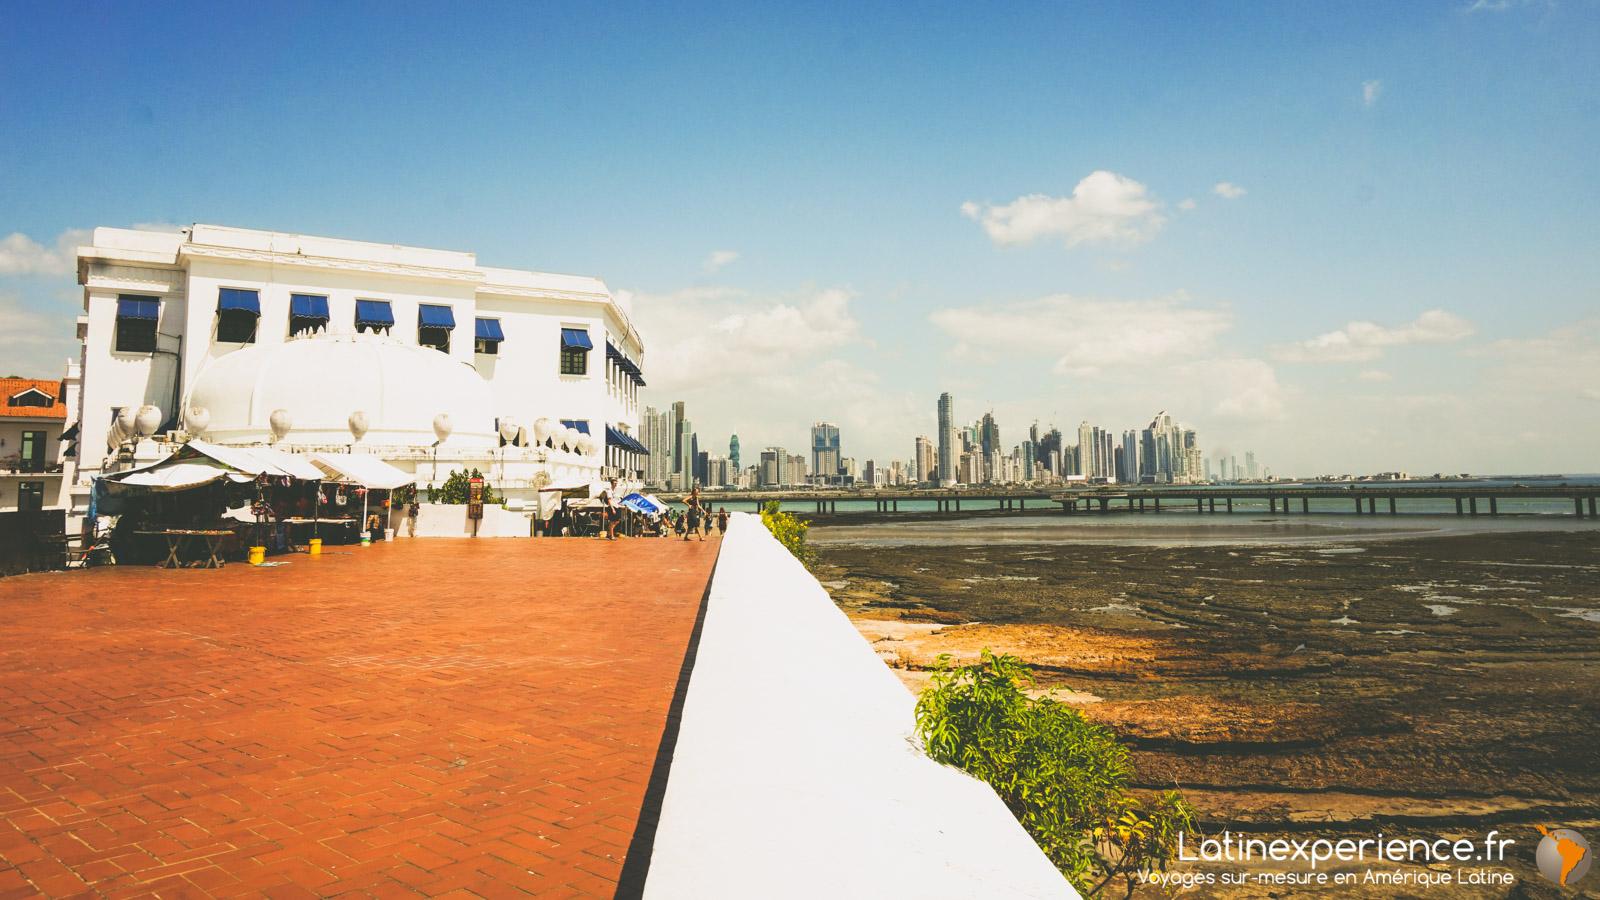 Panama - Casco Viejo - Latinexperience voyages